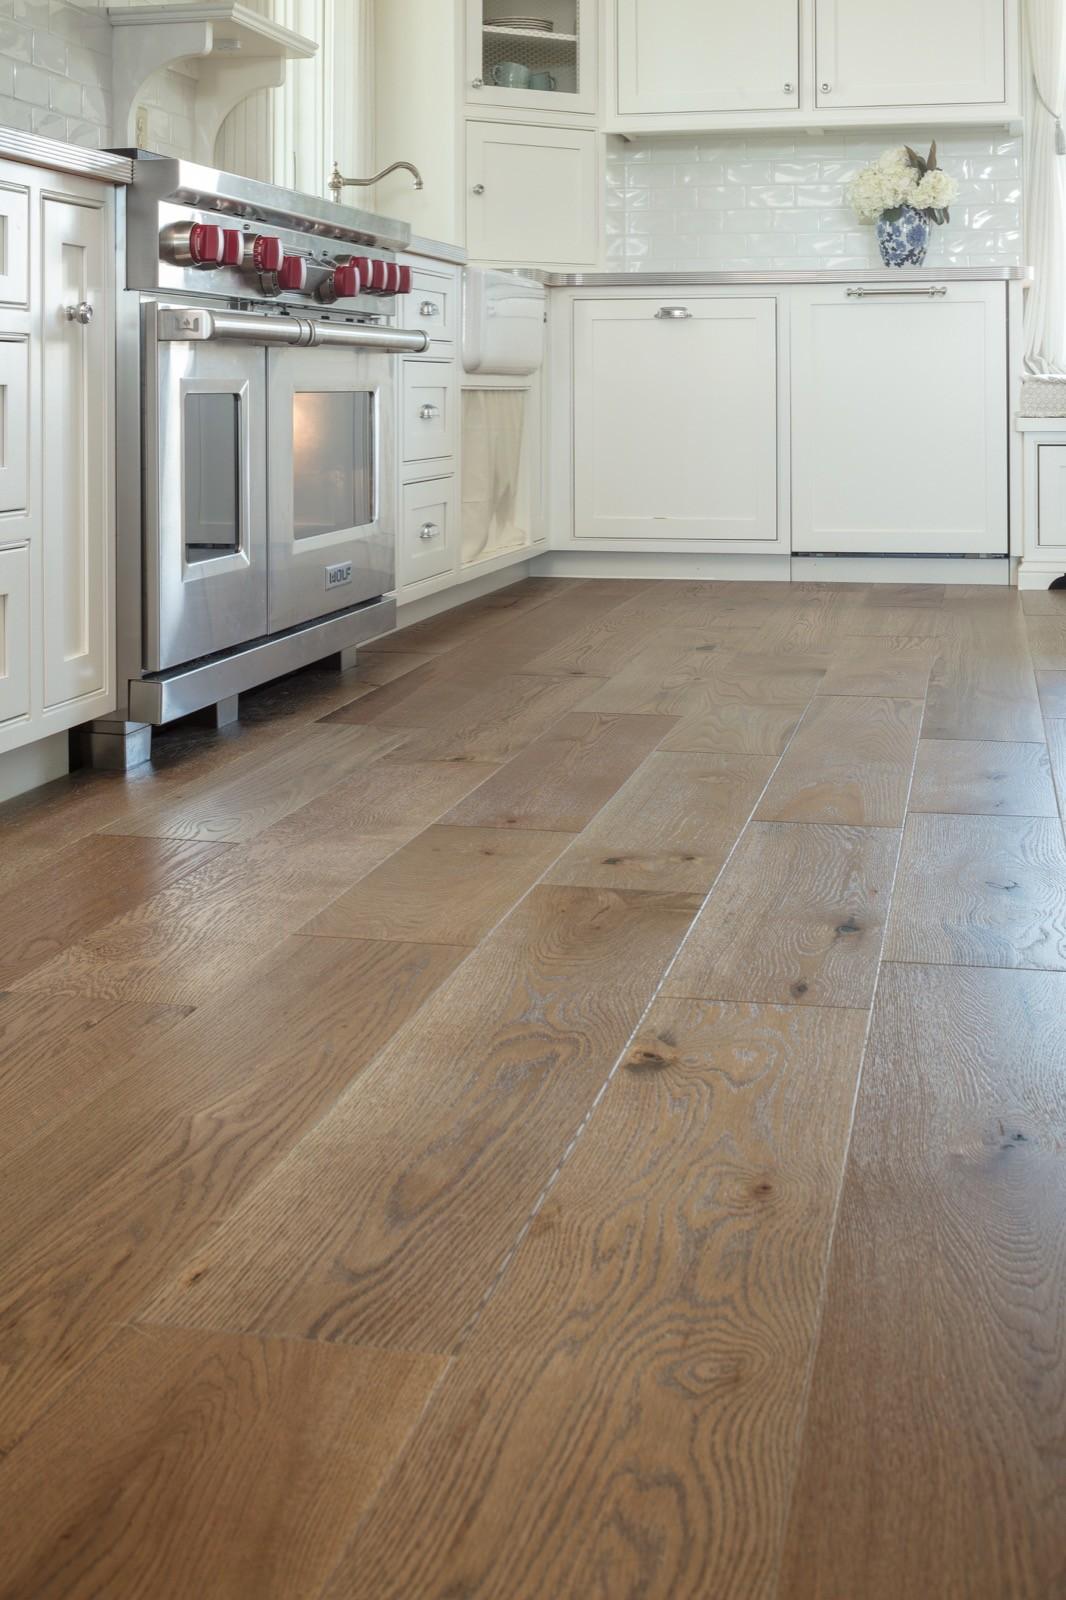 Buckingham flooring | Pierce Flooring